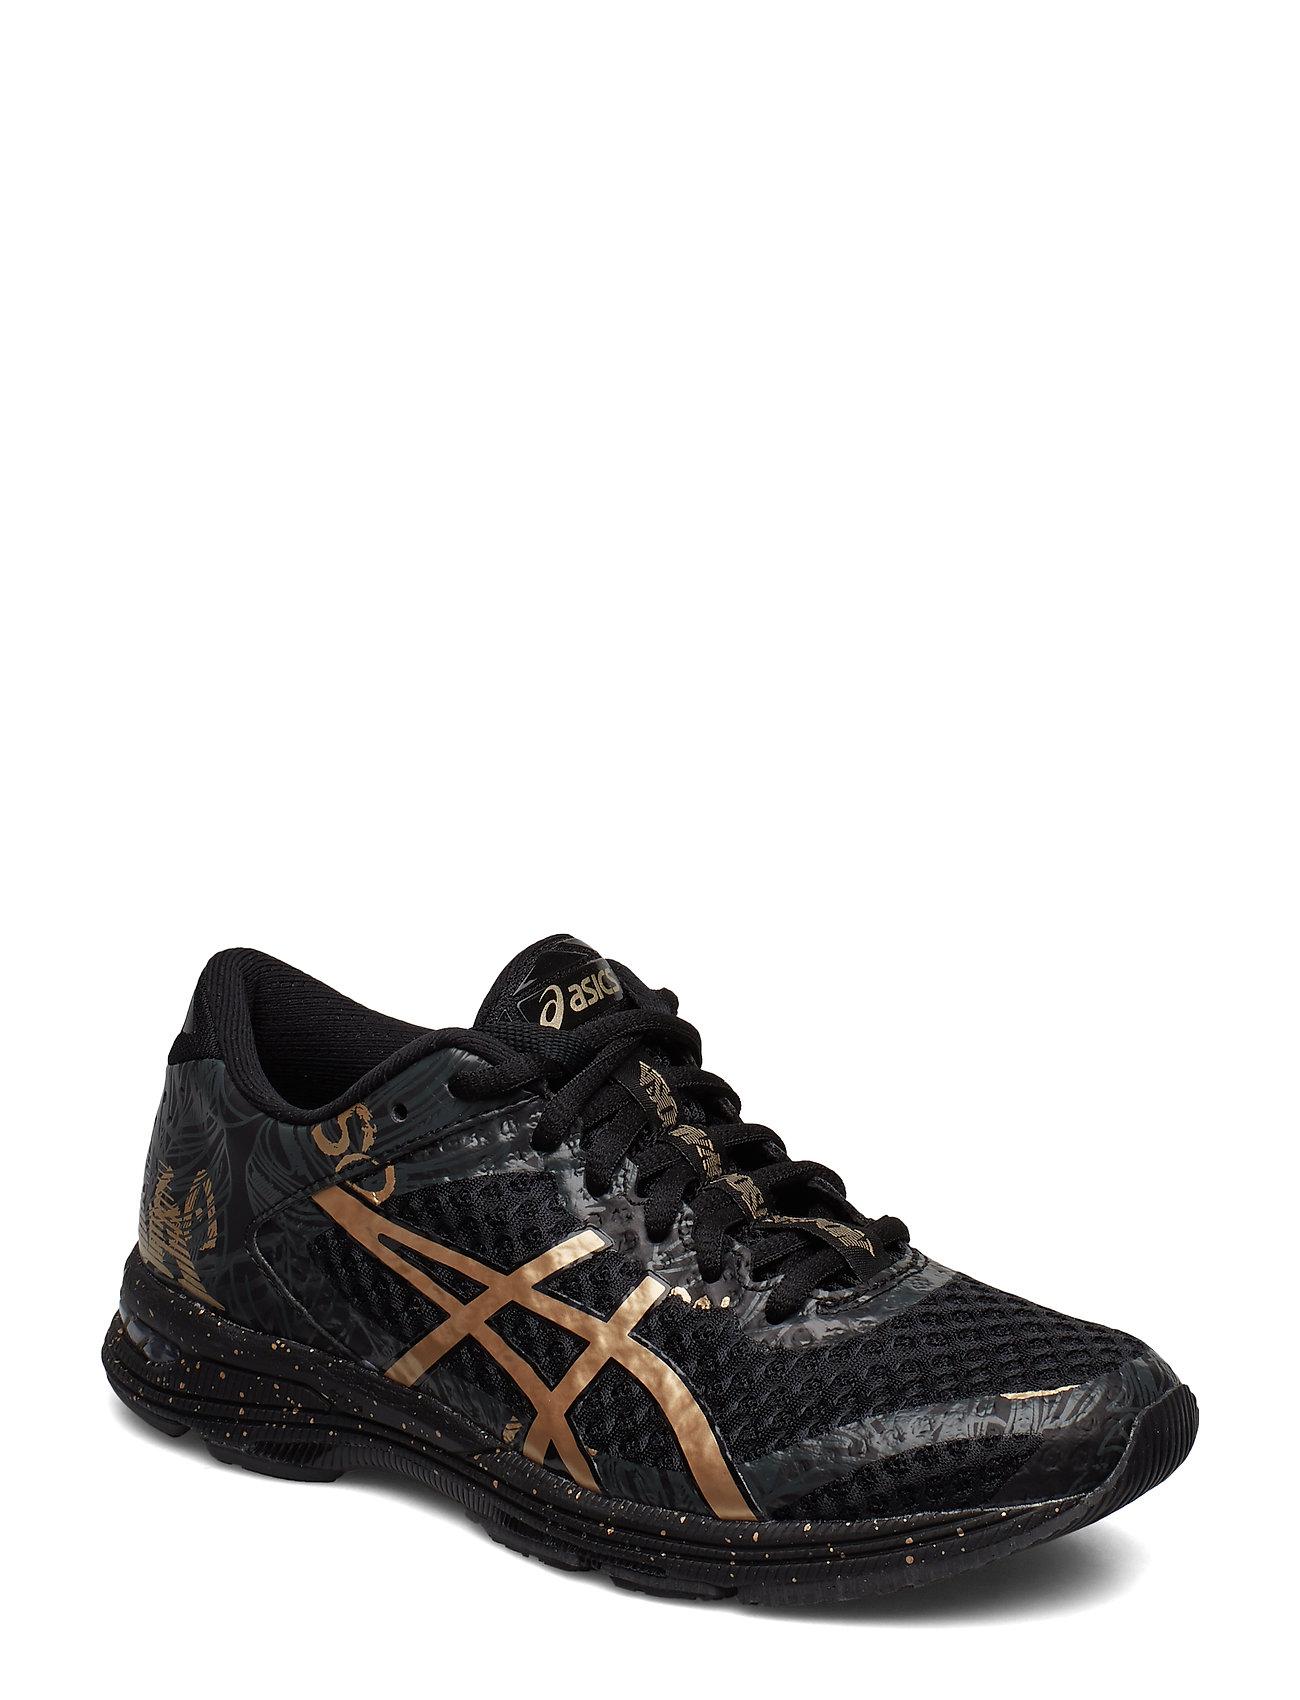 ASICS Gel-Noosa Tri 11 Shoes Sport Shoes Running Shoes Schwarz ASICS